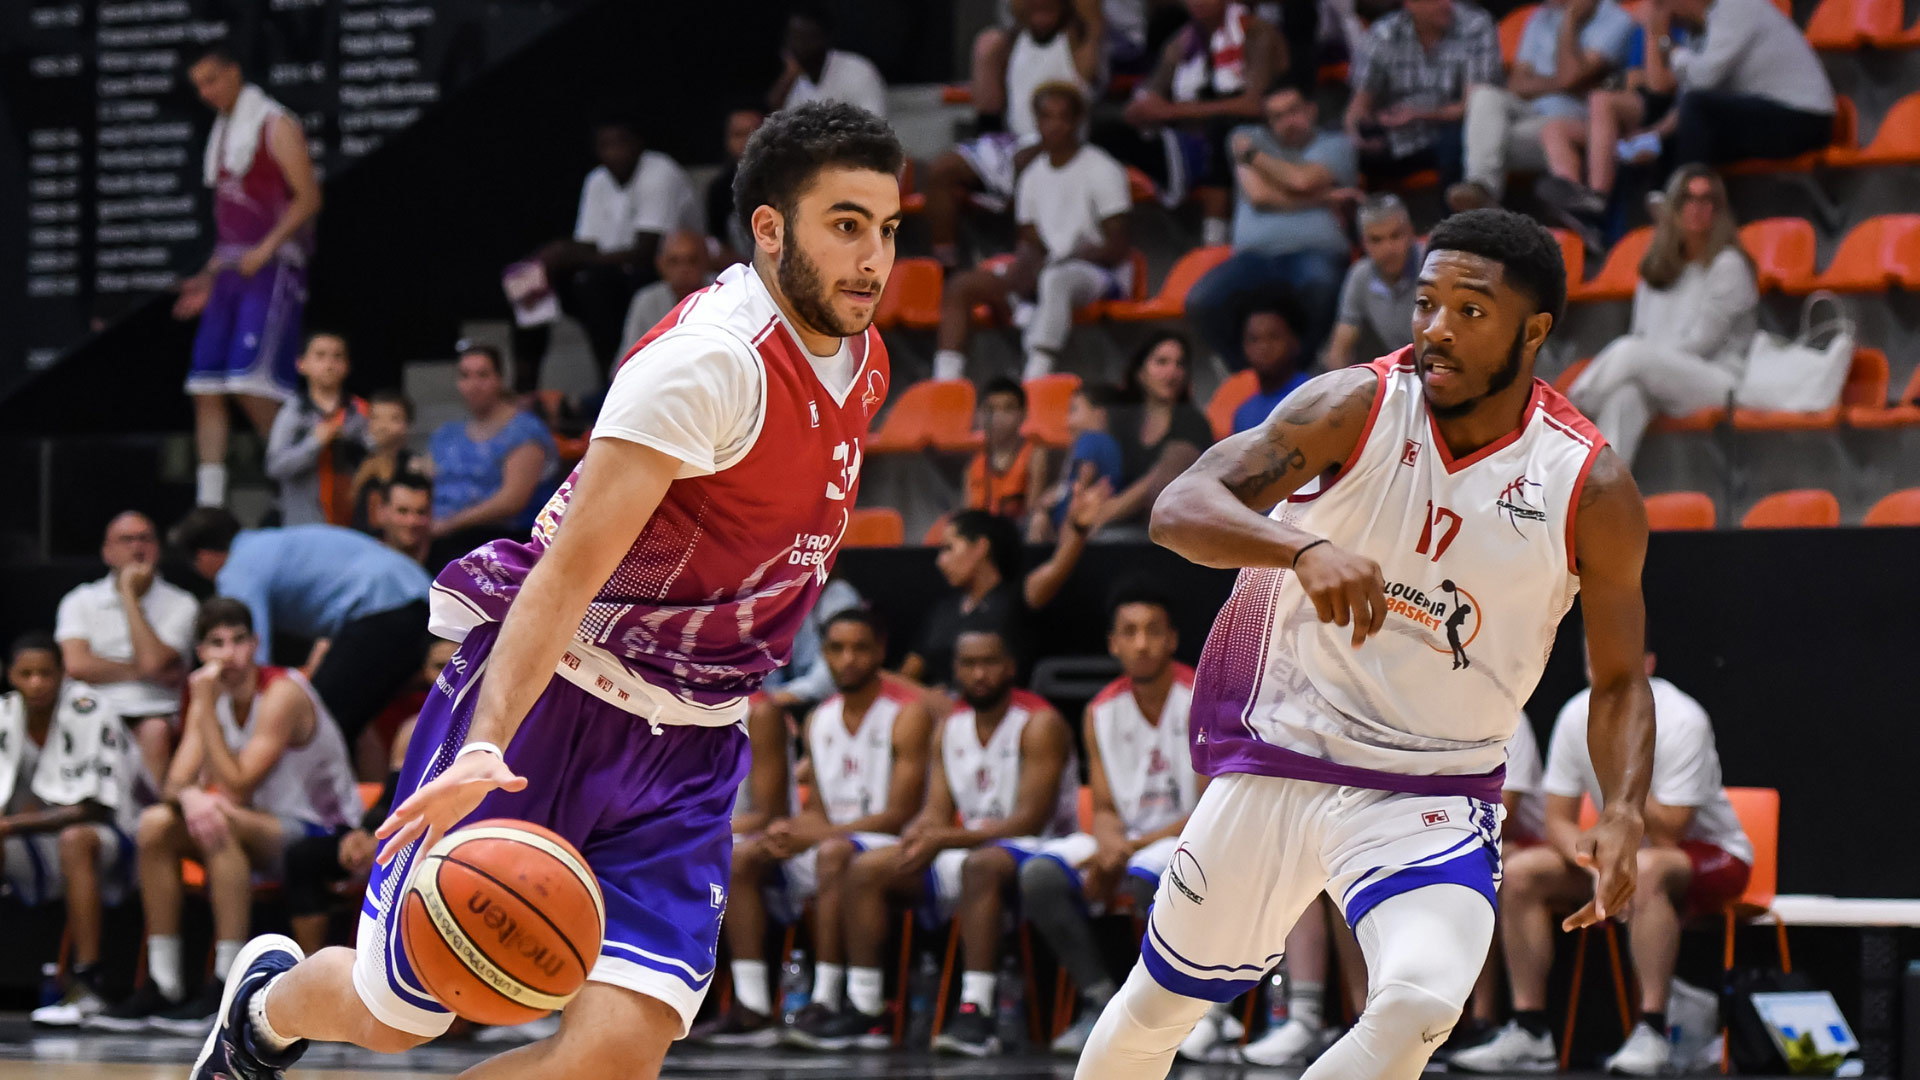 Overseas Basketball Combine teams